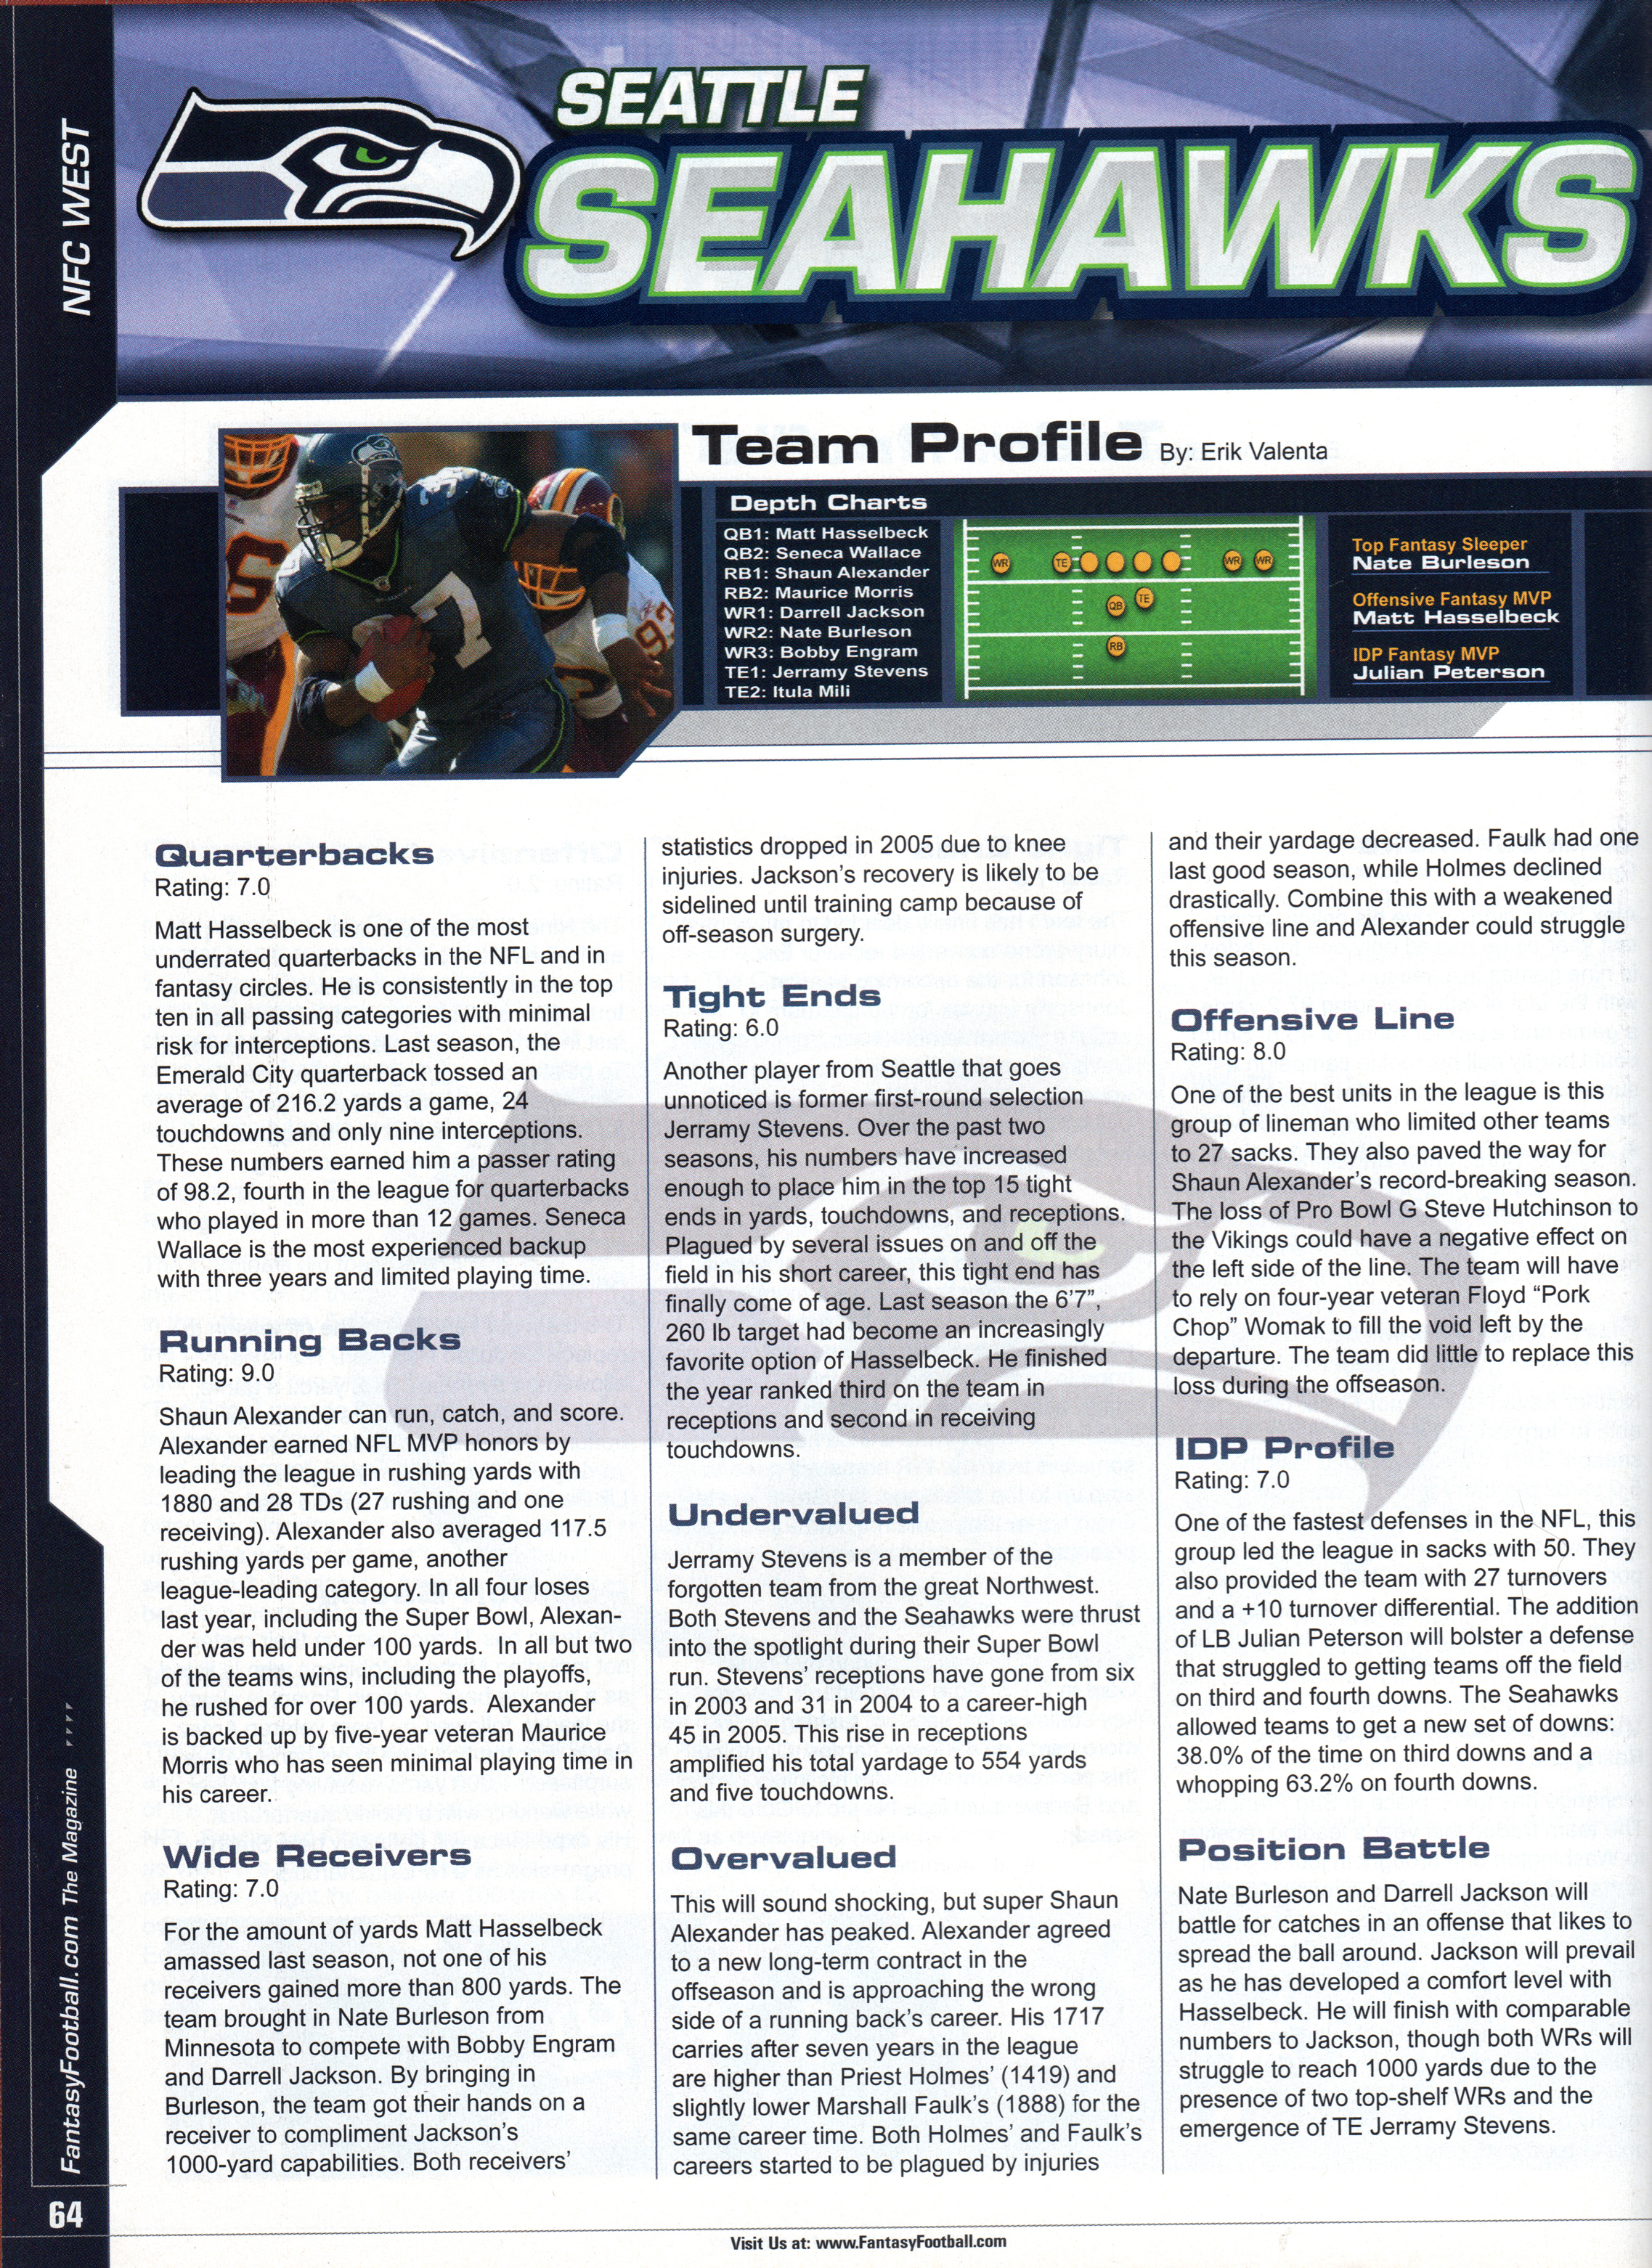 FantasyFootball.com Seahawks Article